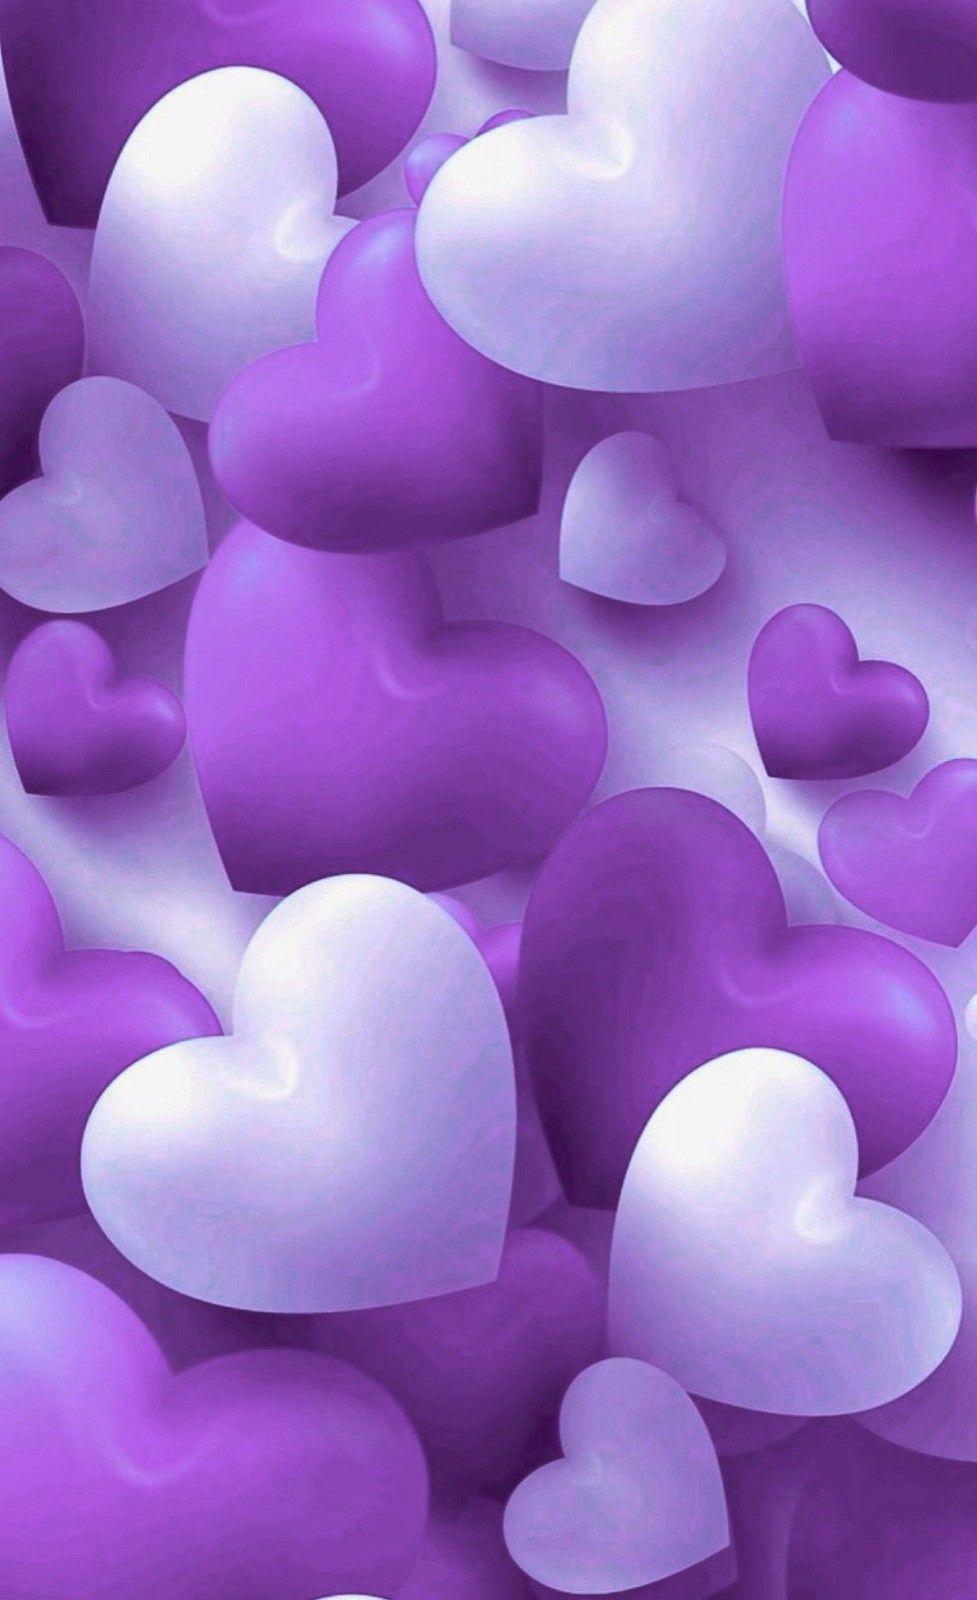 Pin By 紫音 On Heart In Heart Wallpaper Heart Wallpaper Hd Love Wallpaper Download